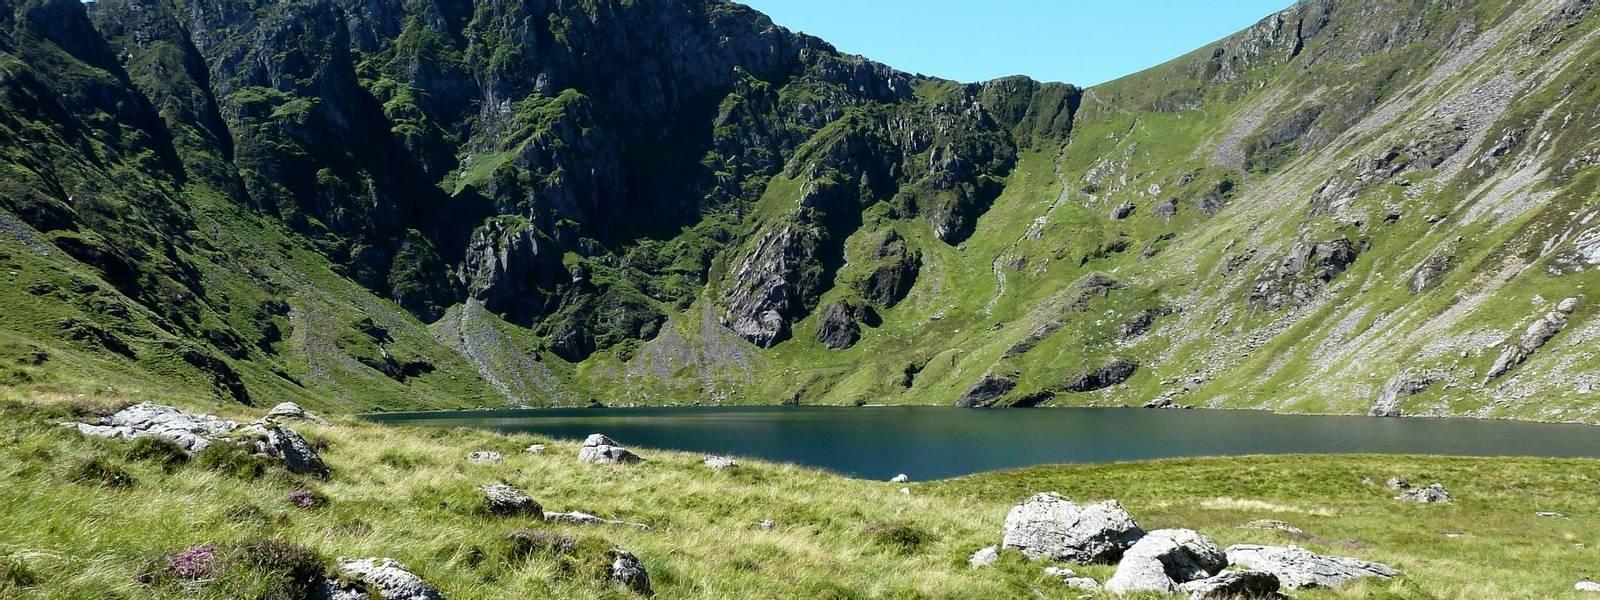 Southern Snowdonia - Dolgellau - AdobeStock_119442937.jpeg